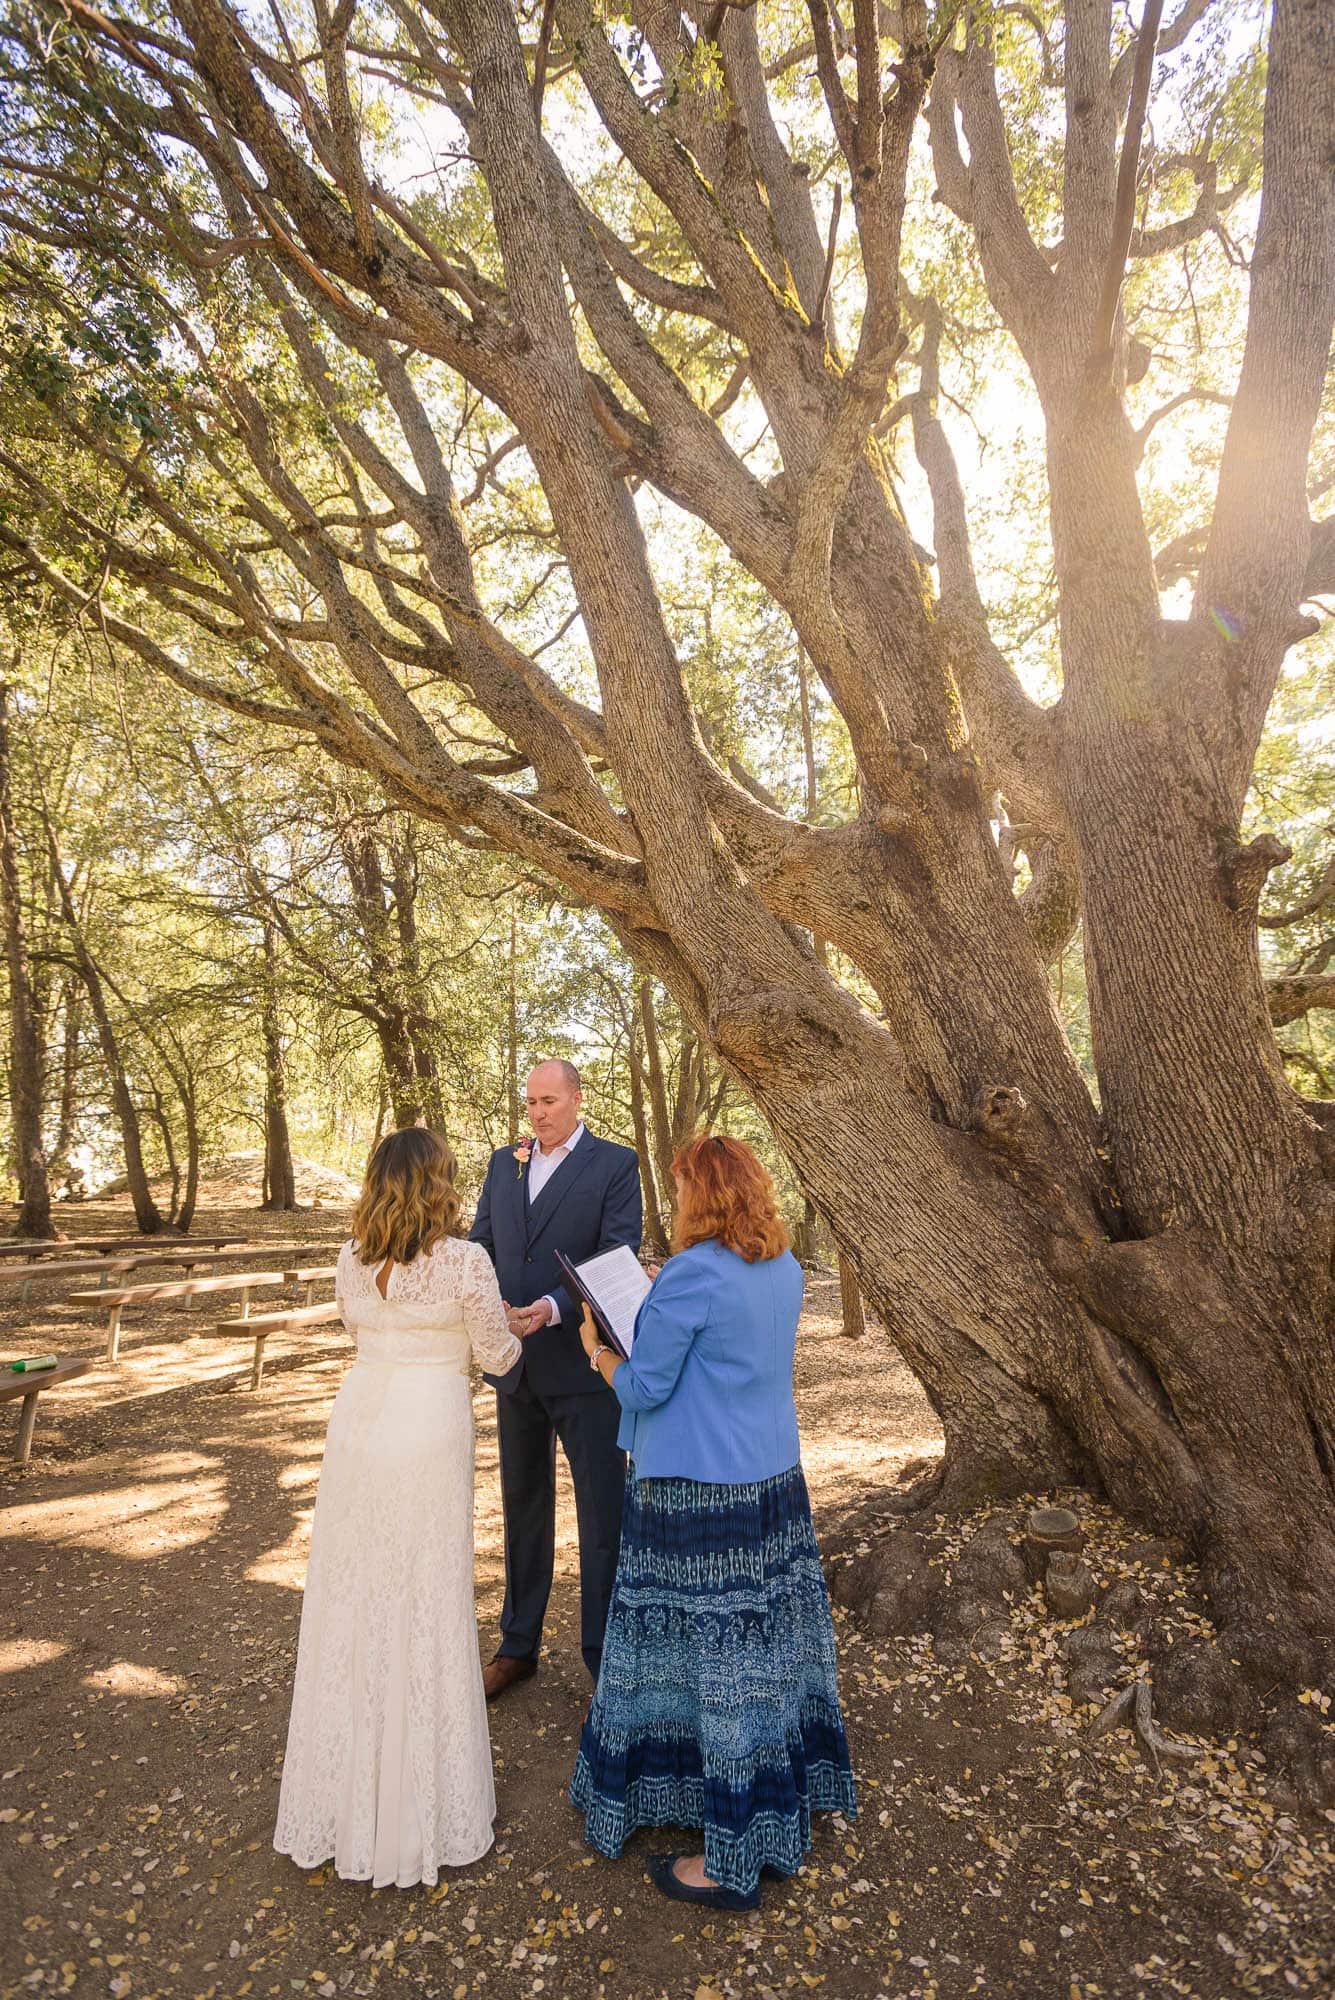 018_Alan_and_Heidi_Wedding_Jackie_Dannon